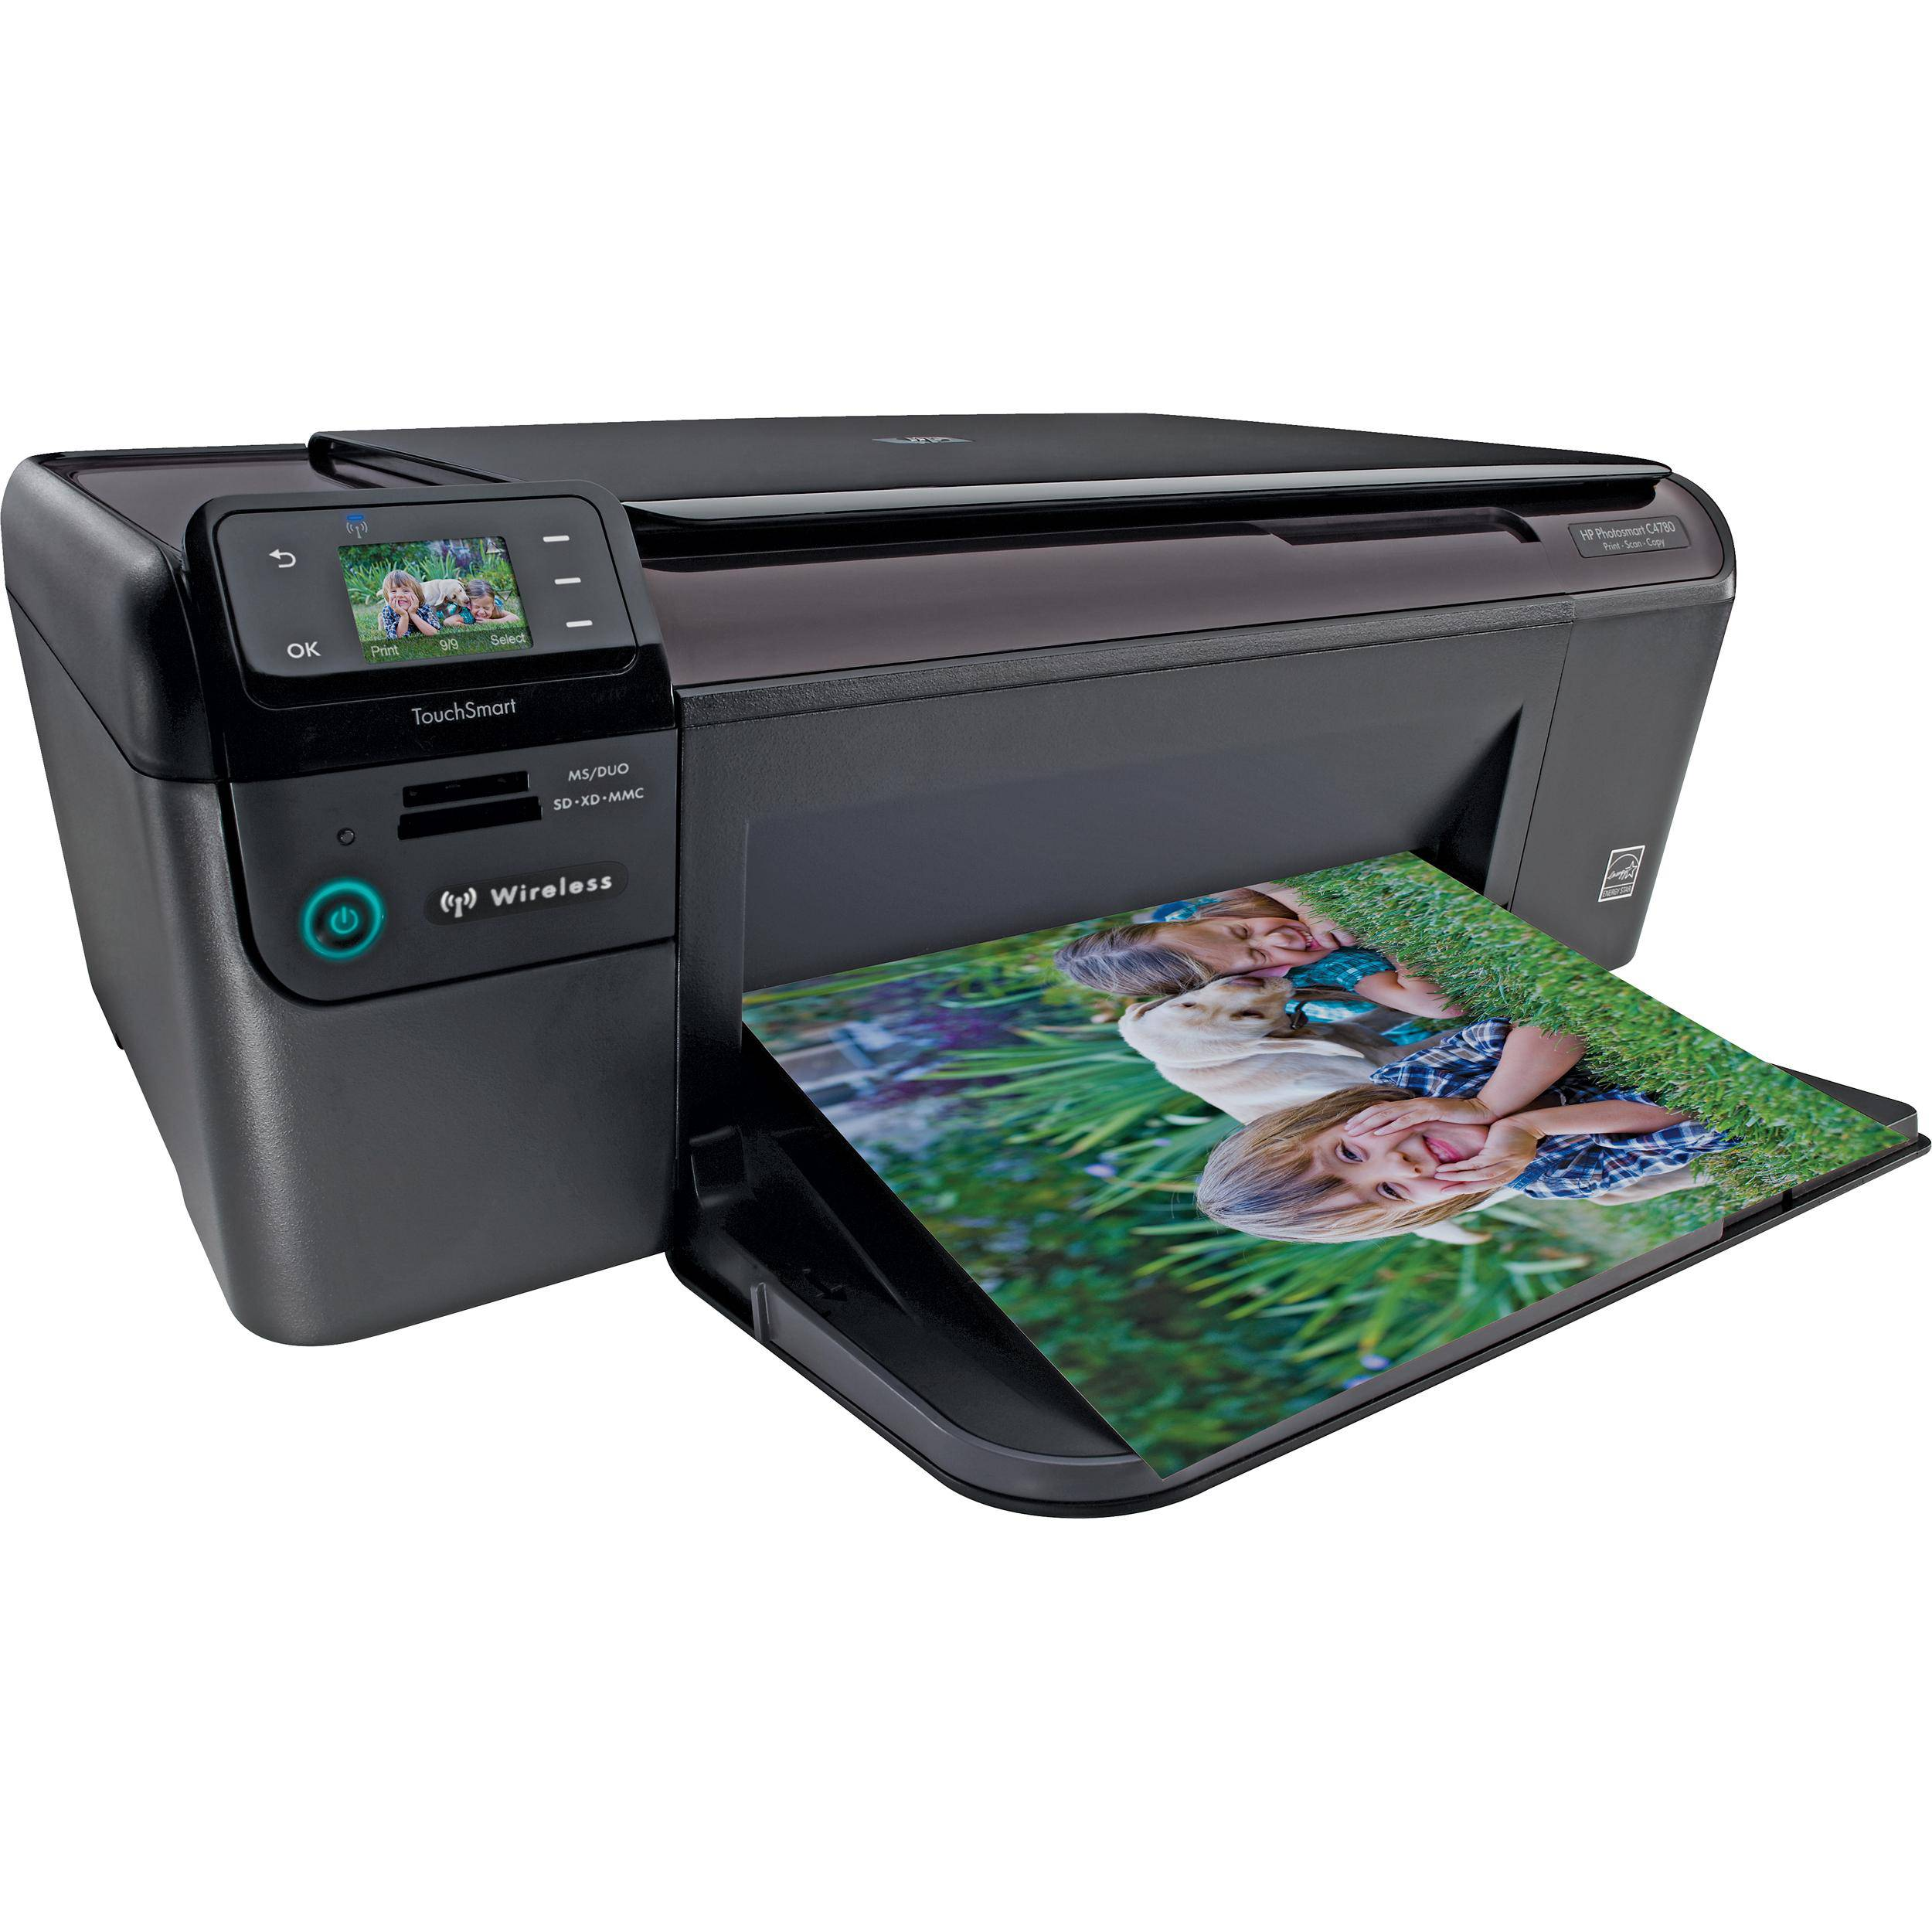 HP Photosmart C4780 All-in-One Wireless Printer